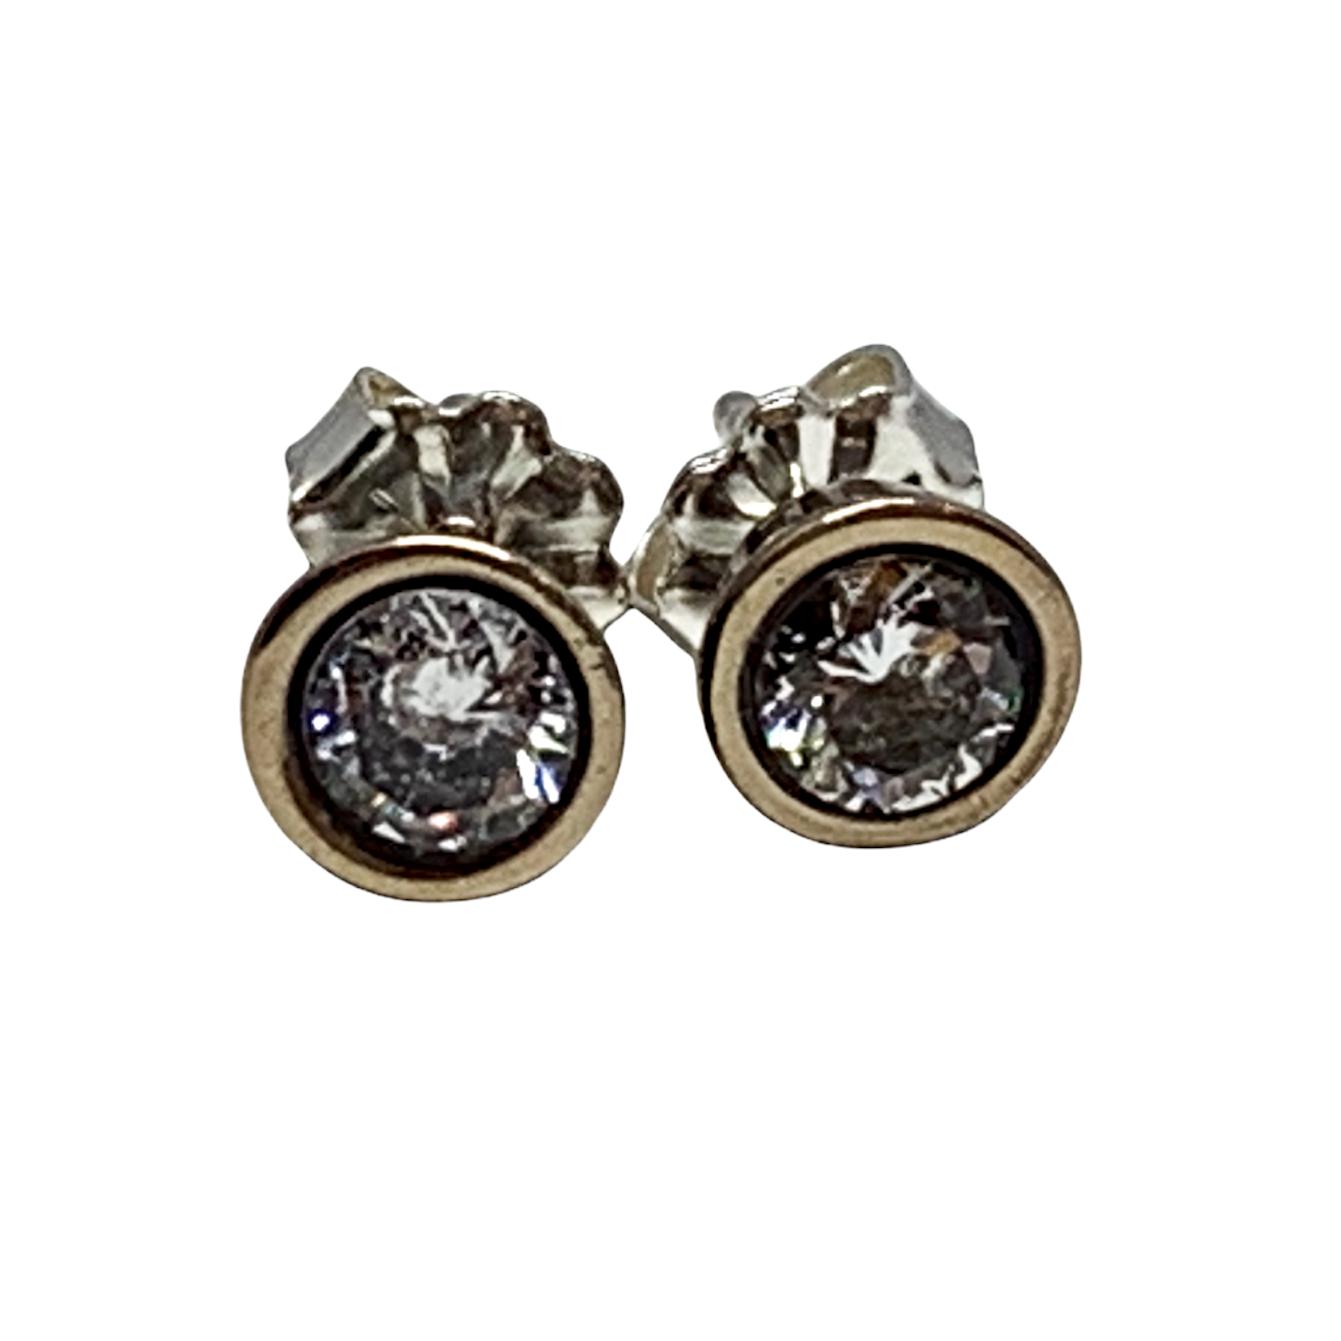 Bronze + CZ stud earrings by Karyn Chopik | Effusion Art Gallery + Cast Glass Studio, Invermere BC